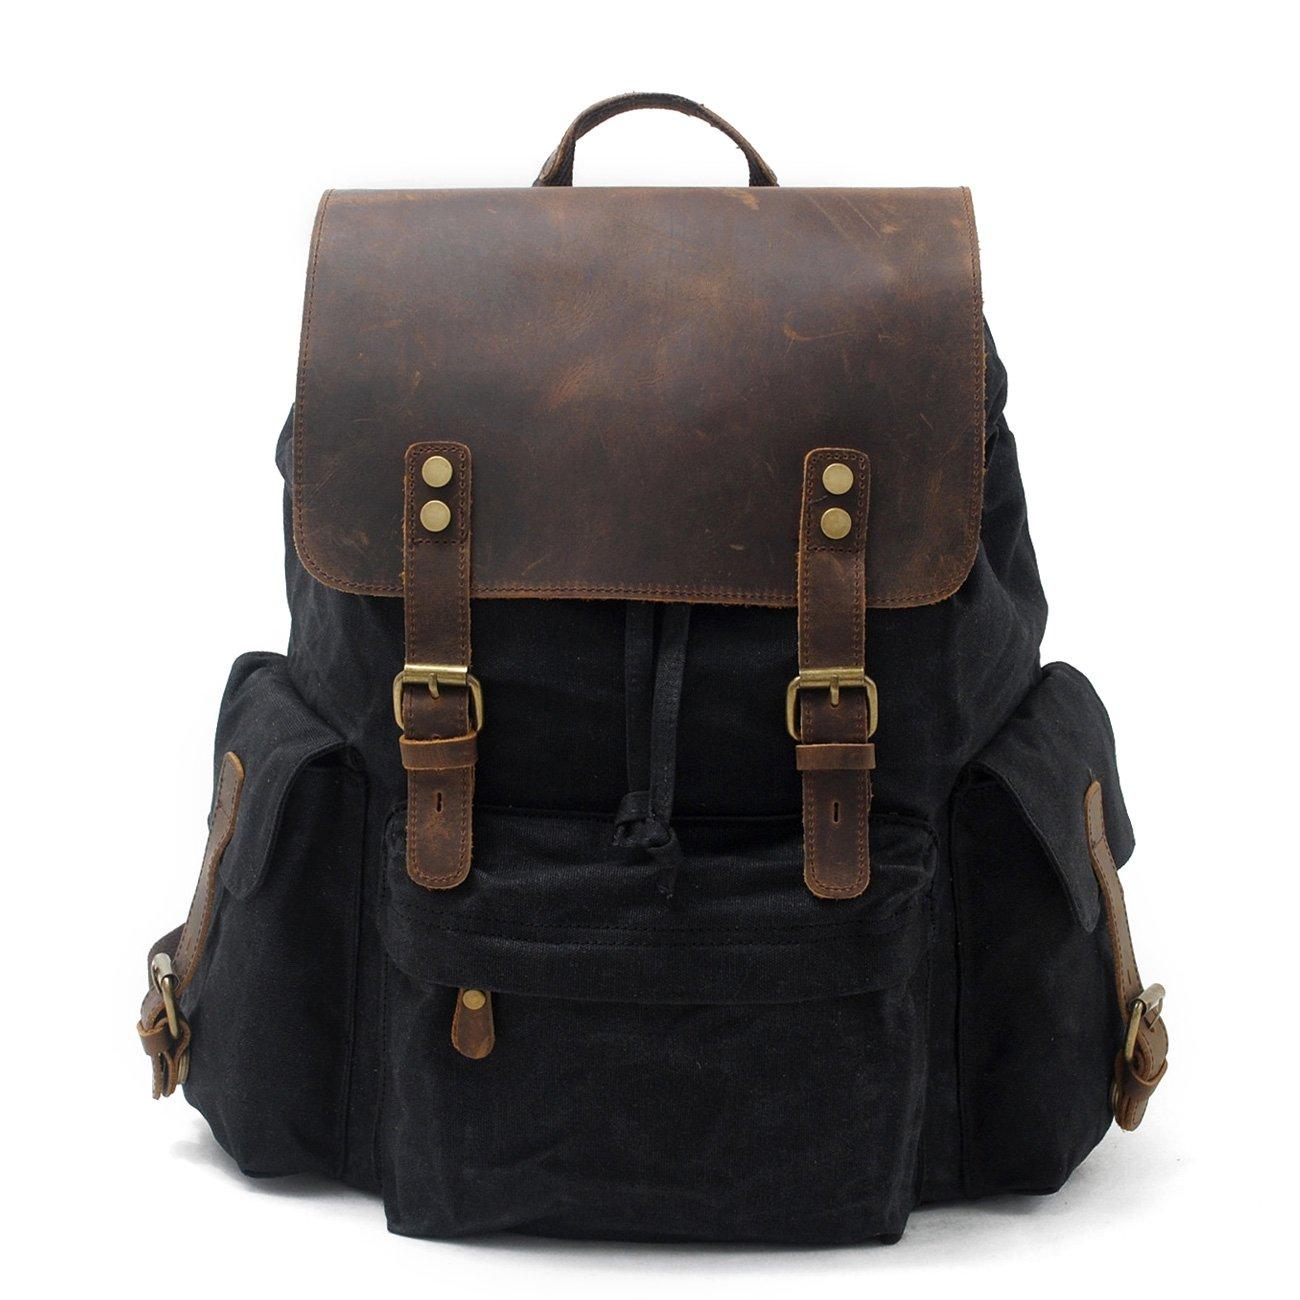 Backpack Women & Men H-ANDYBAG Waxed Canvas School Rucksack Backpack Bag Leather Large 15.6 Inch Laptop Black